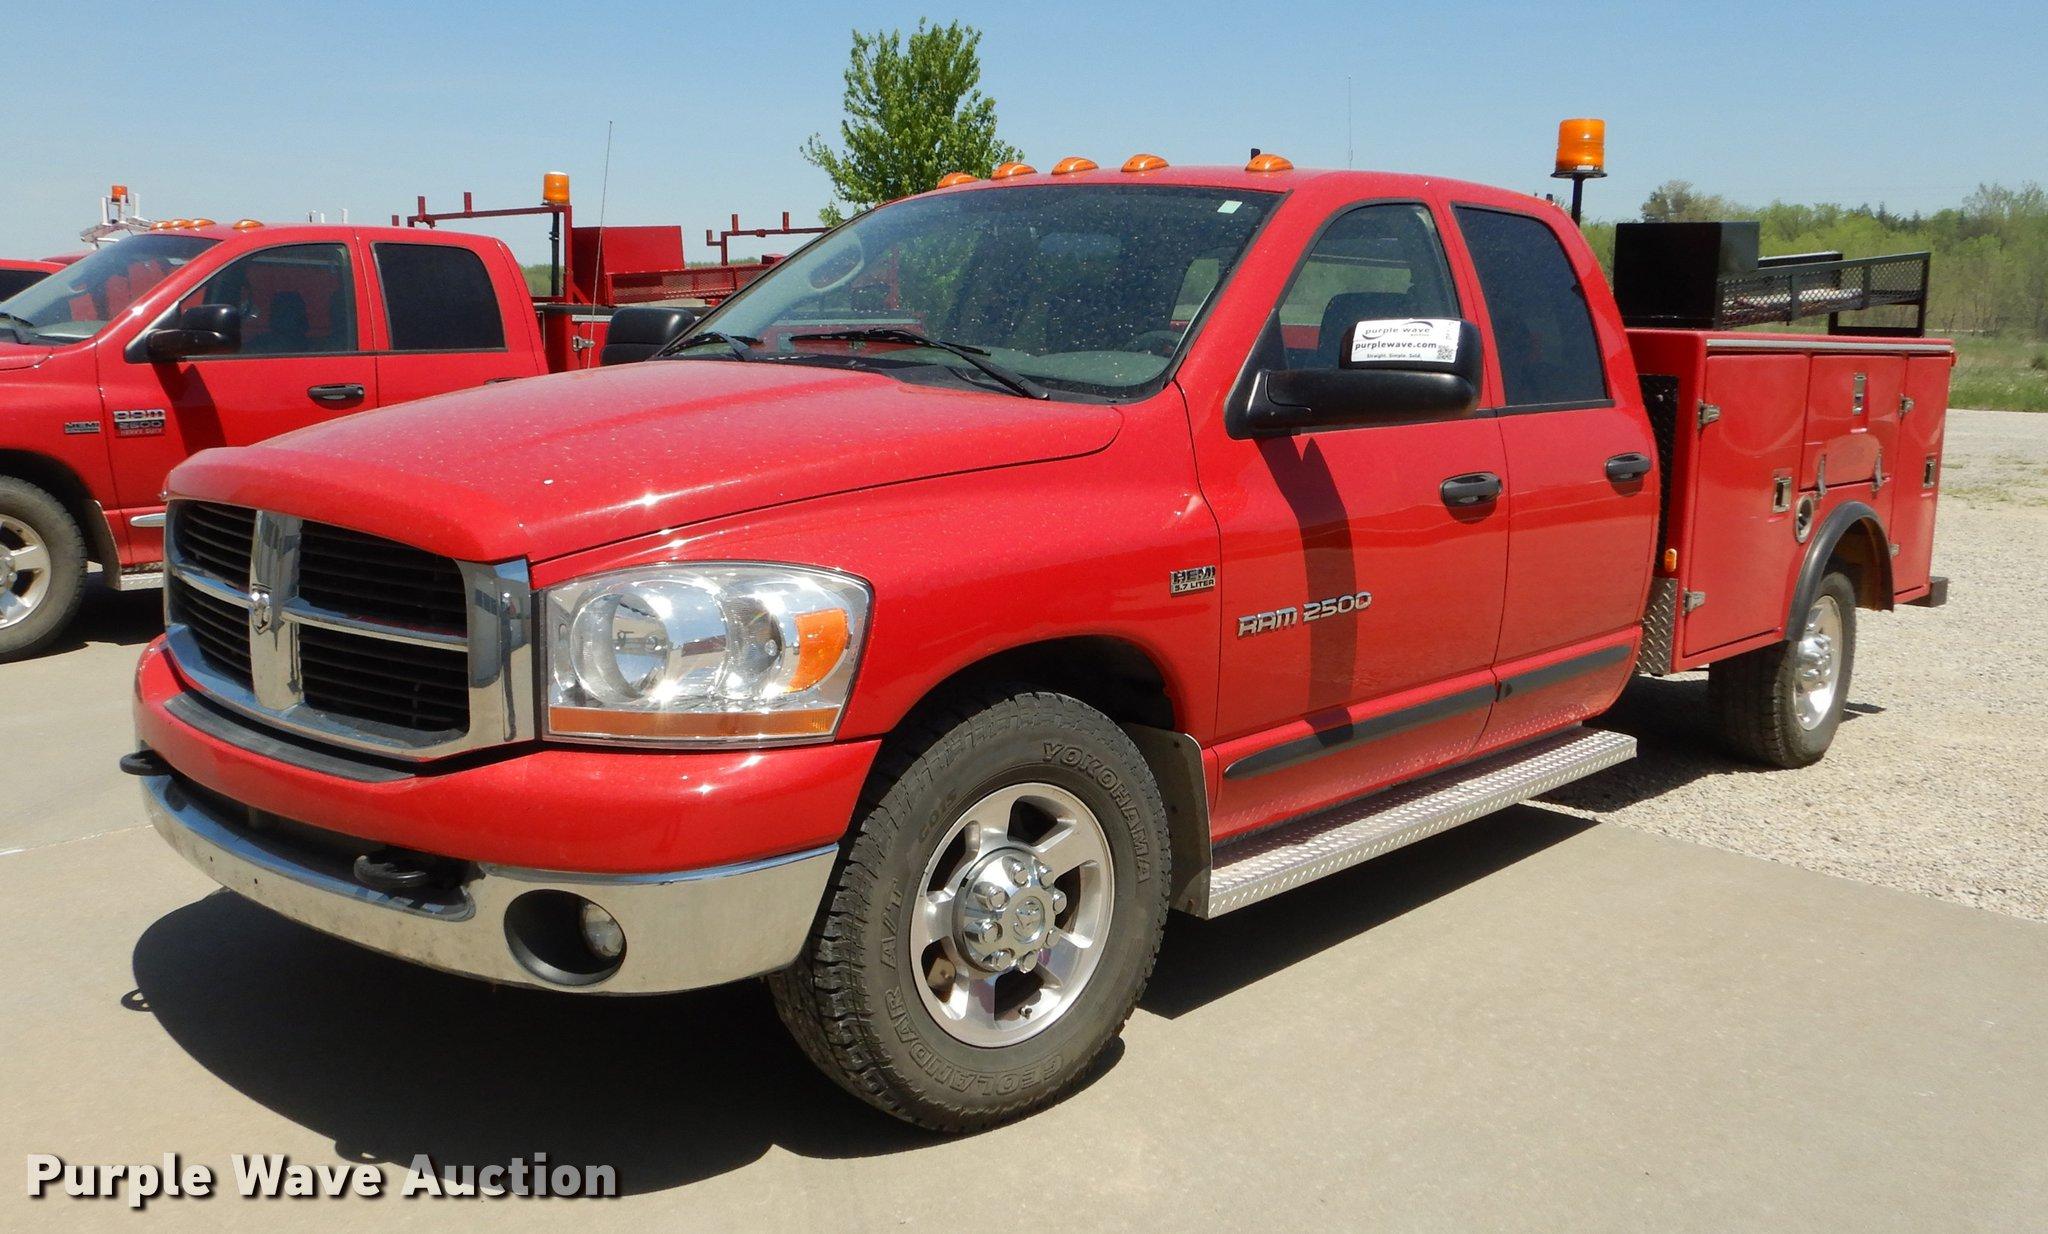 2006 Dodge Ram 2500 Quad Cab Utility Bed Pickup Truck Item